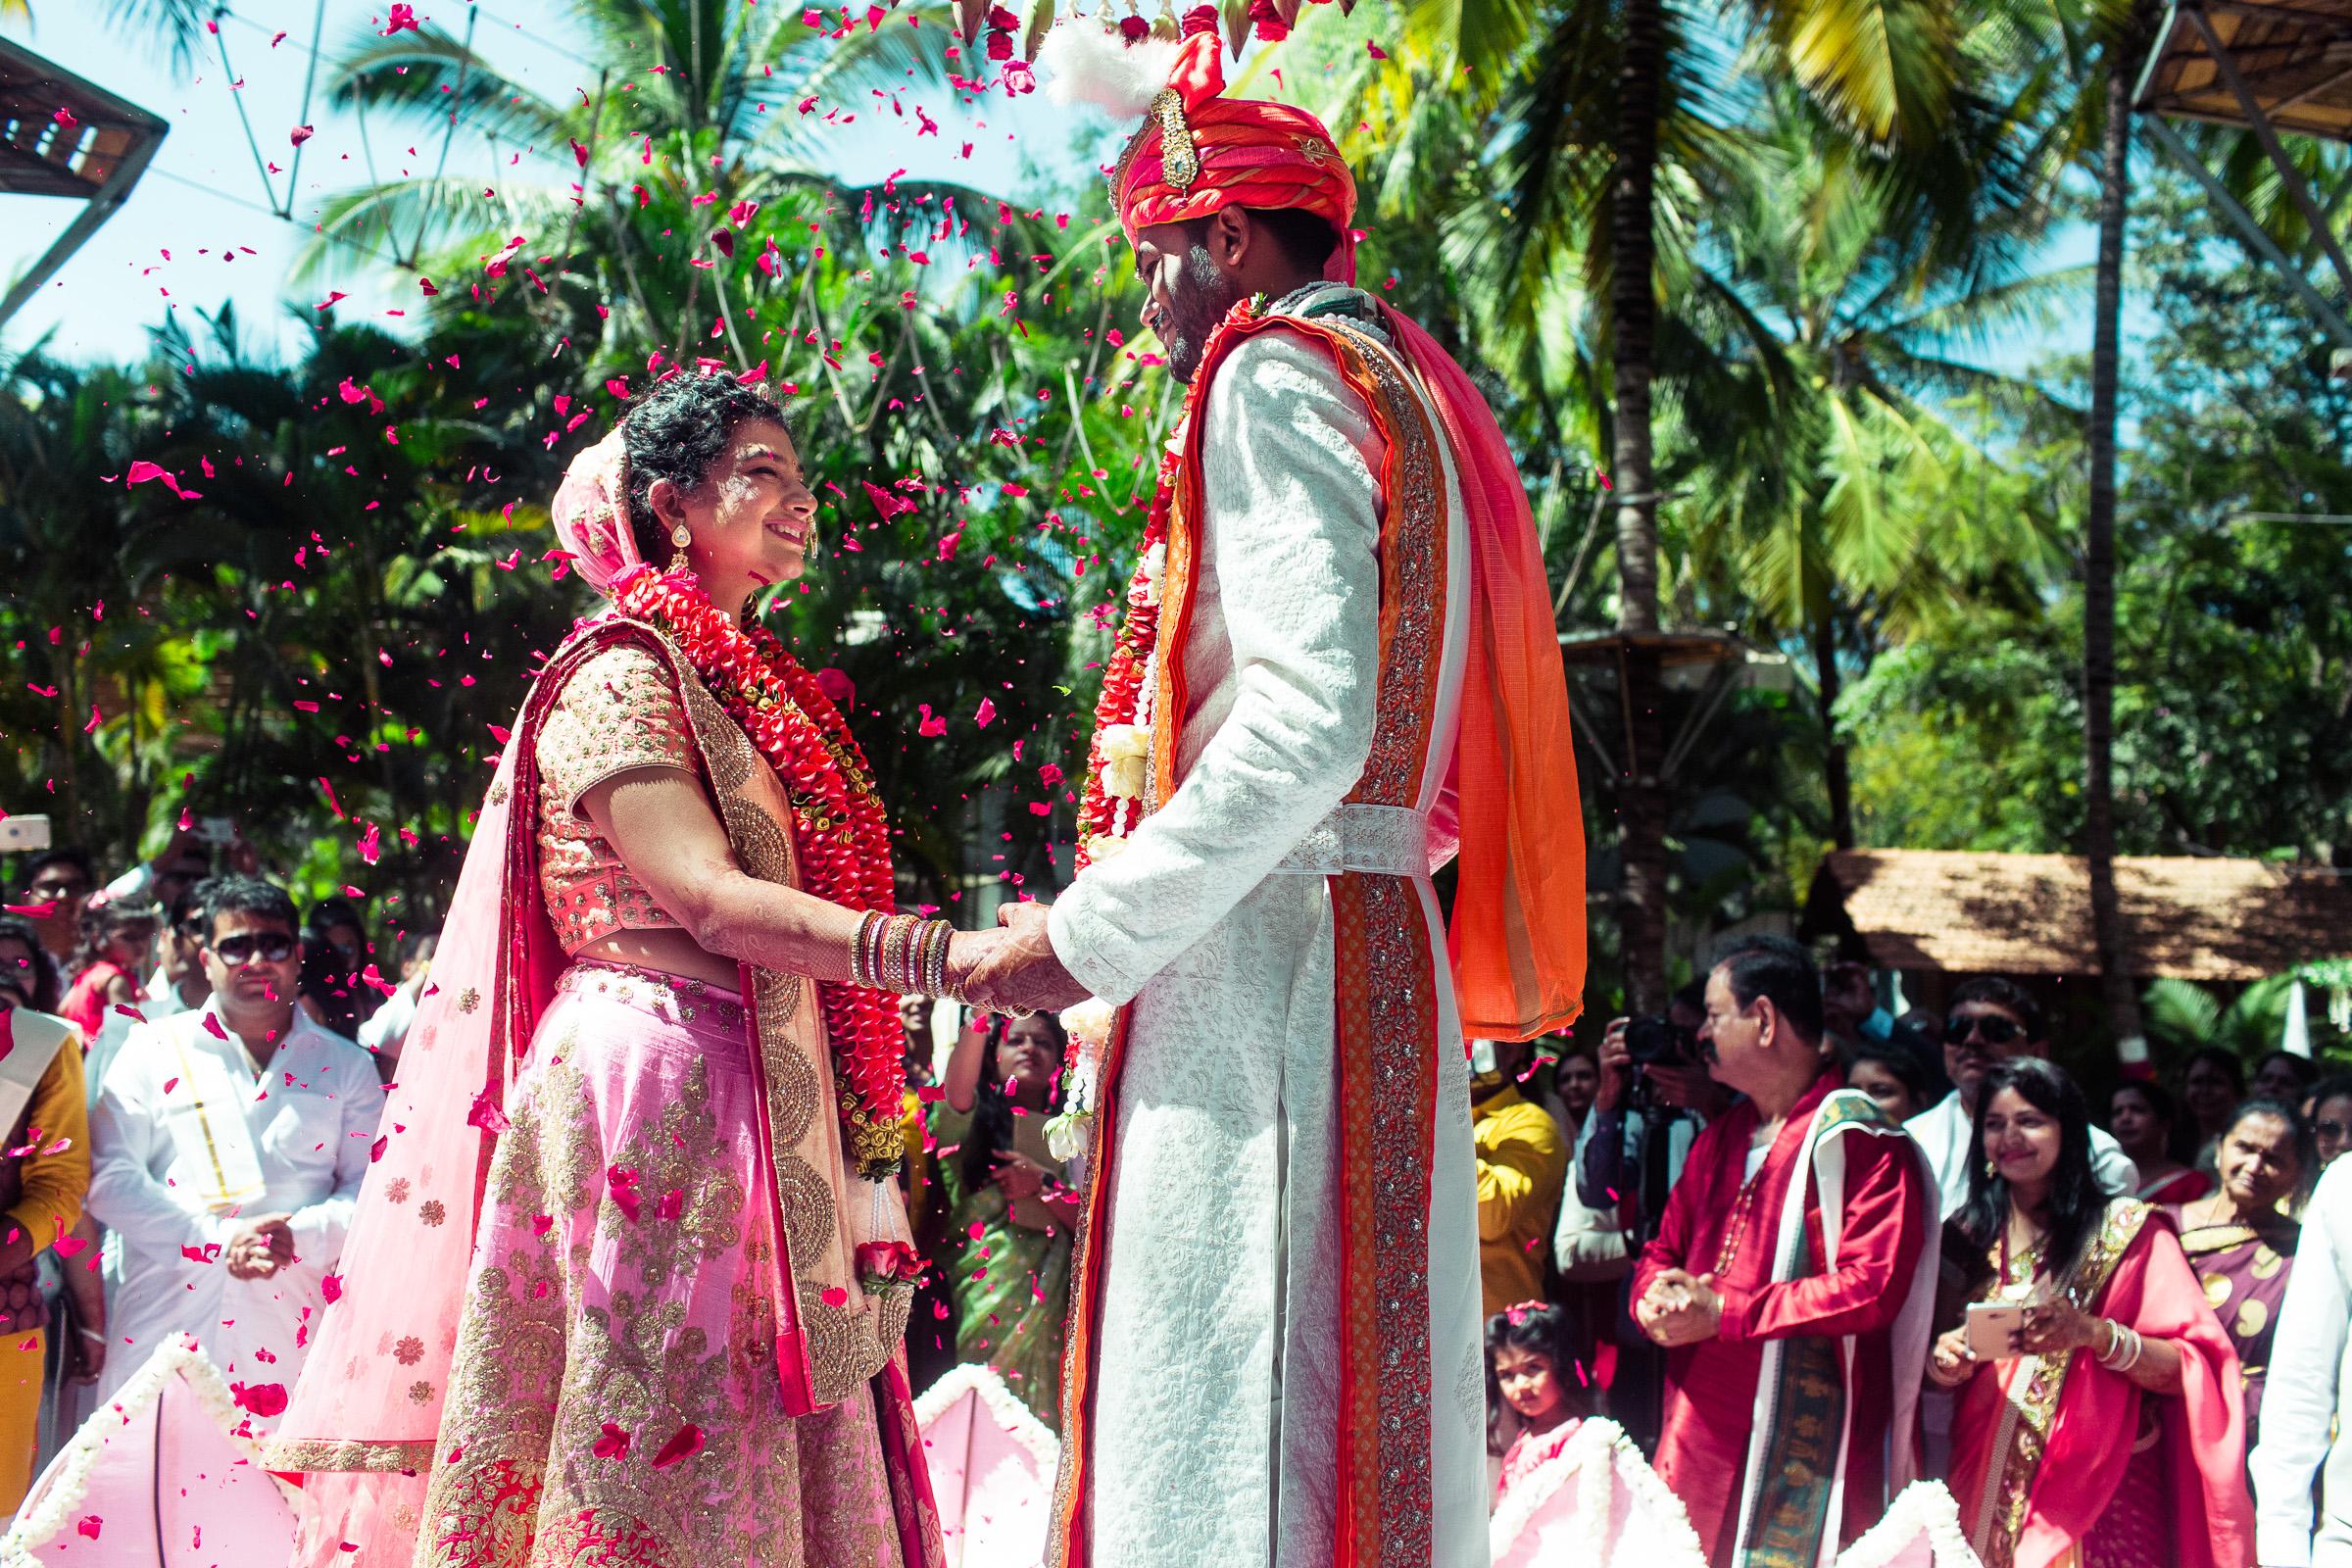 marwari-candid-wedding-photographers-bangalore-0031.jpg